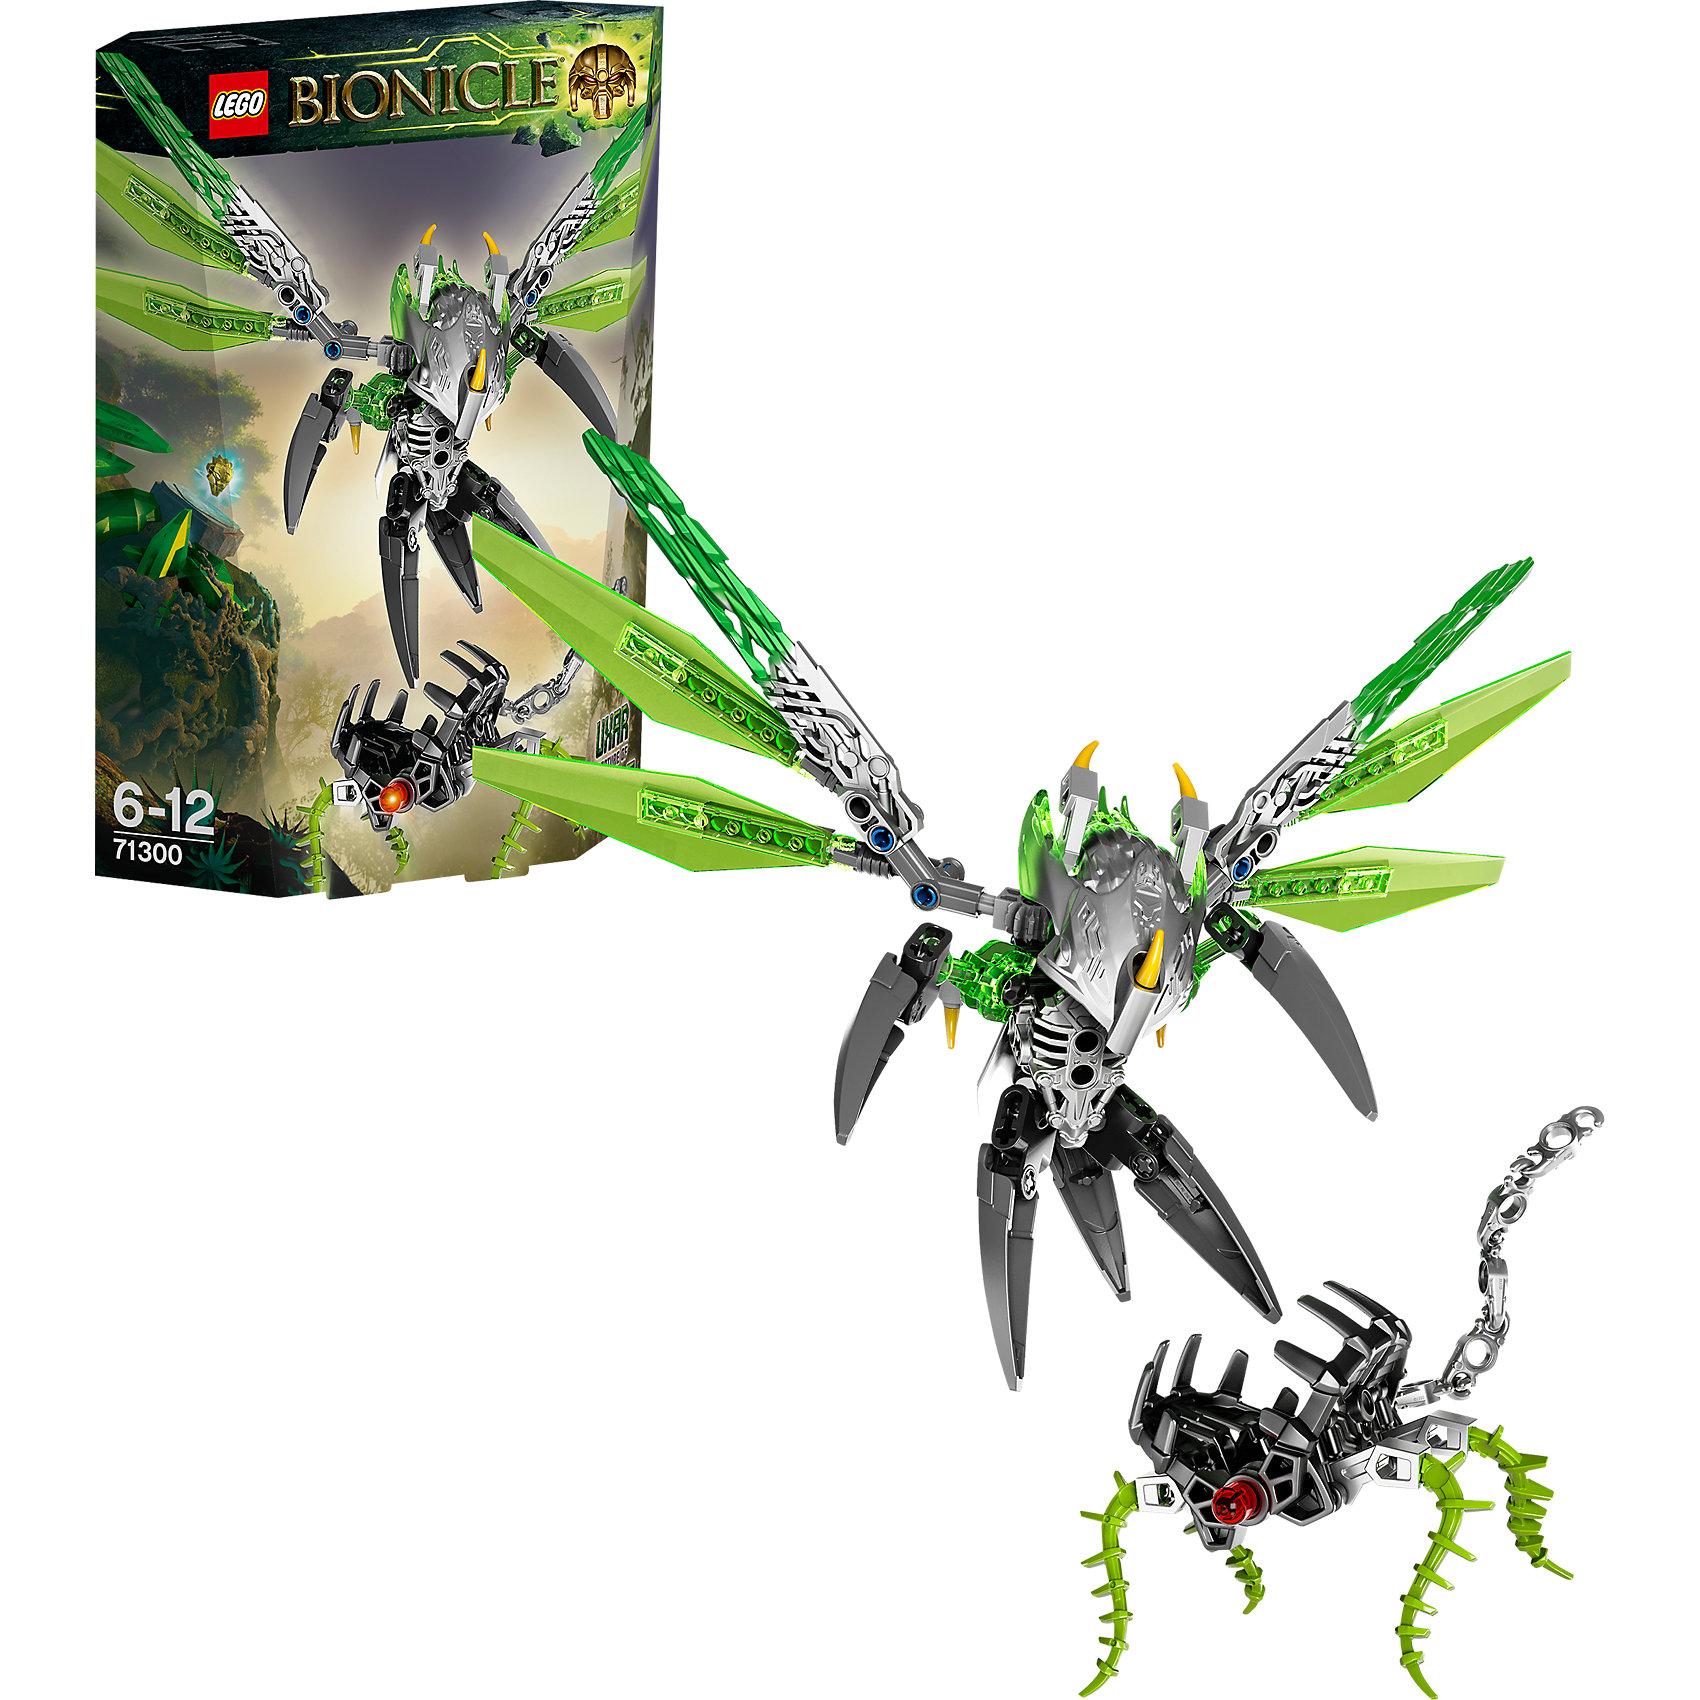 LEGO LEGO BIONICLE 71300: Уксар, Тотемное животное Джунглей bionicle максилос и спинакс